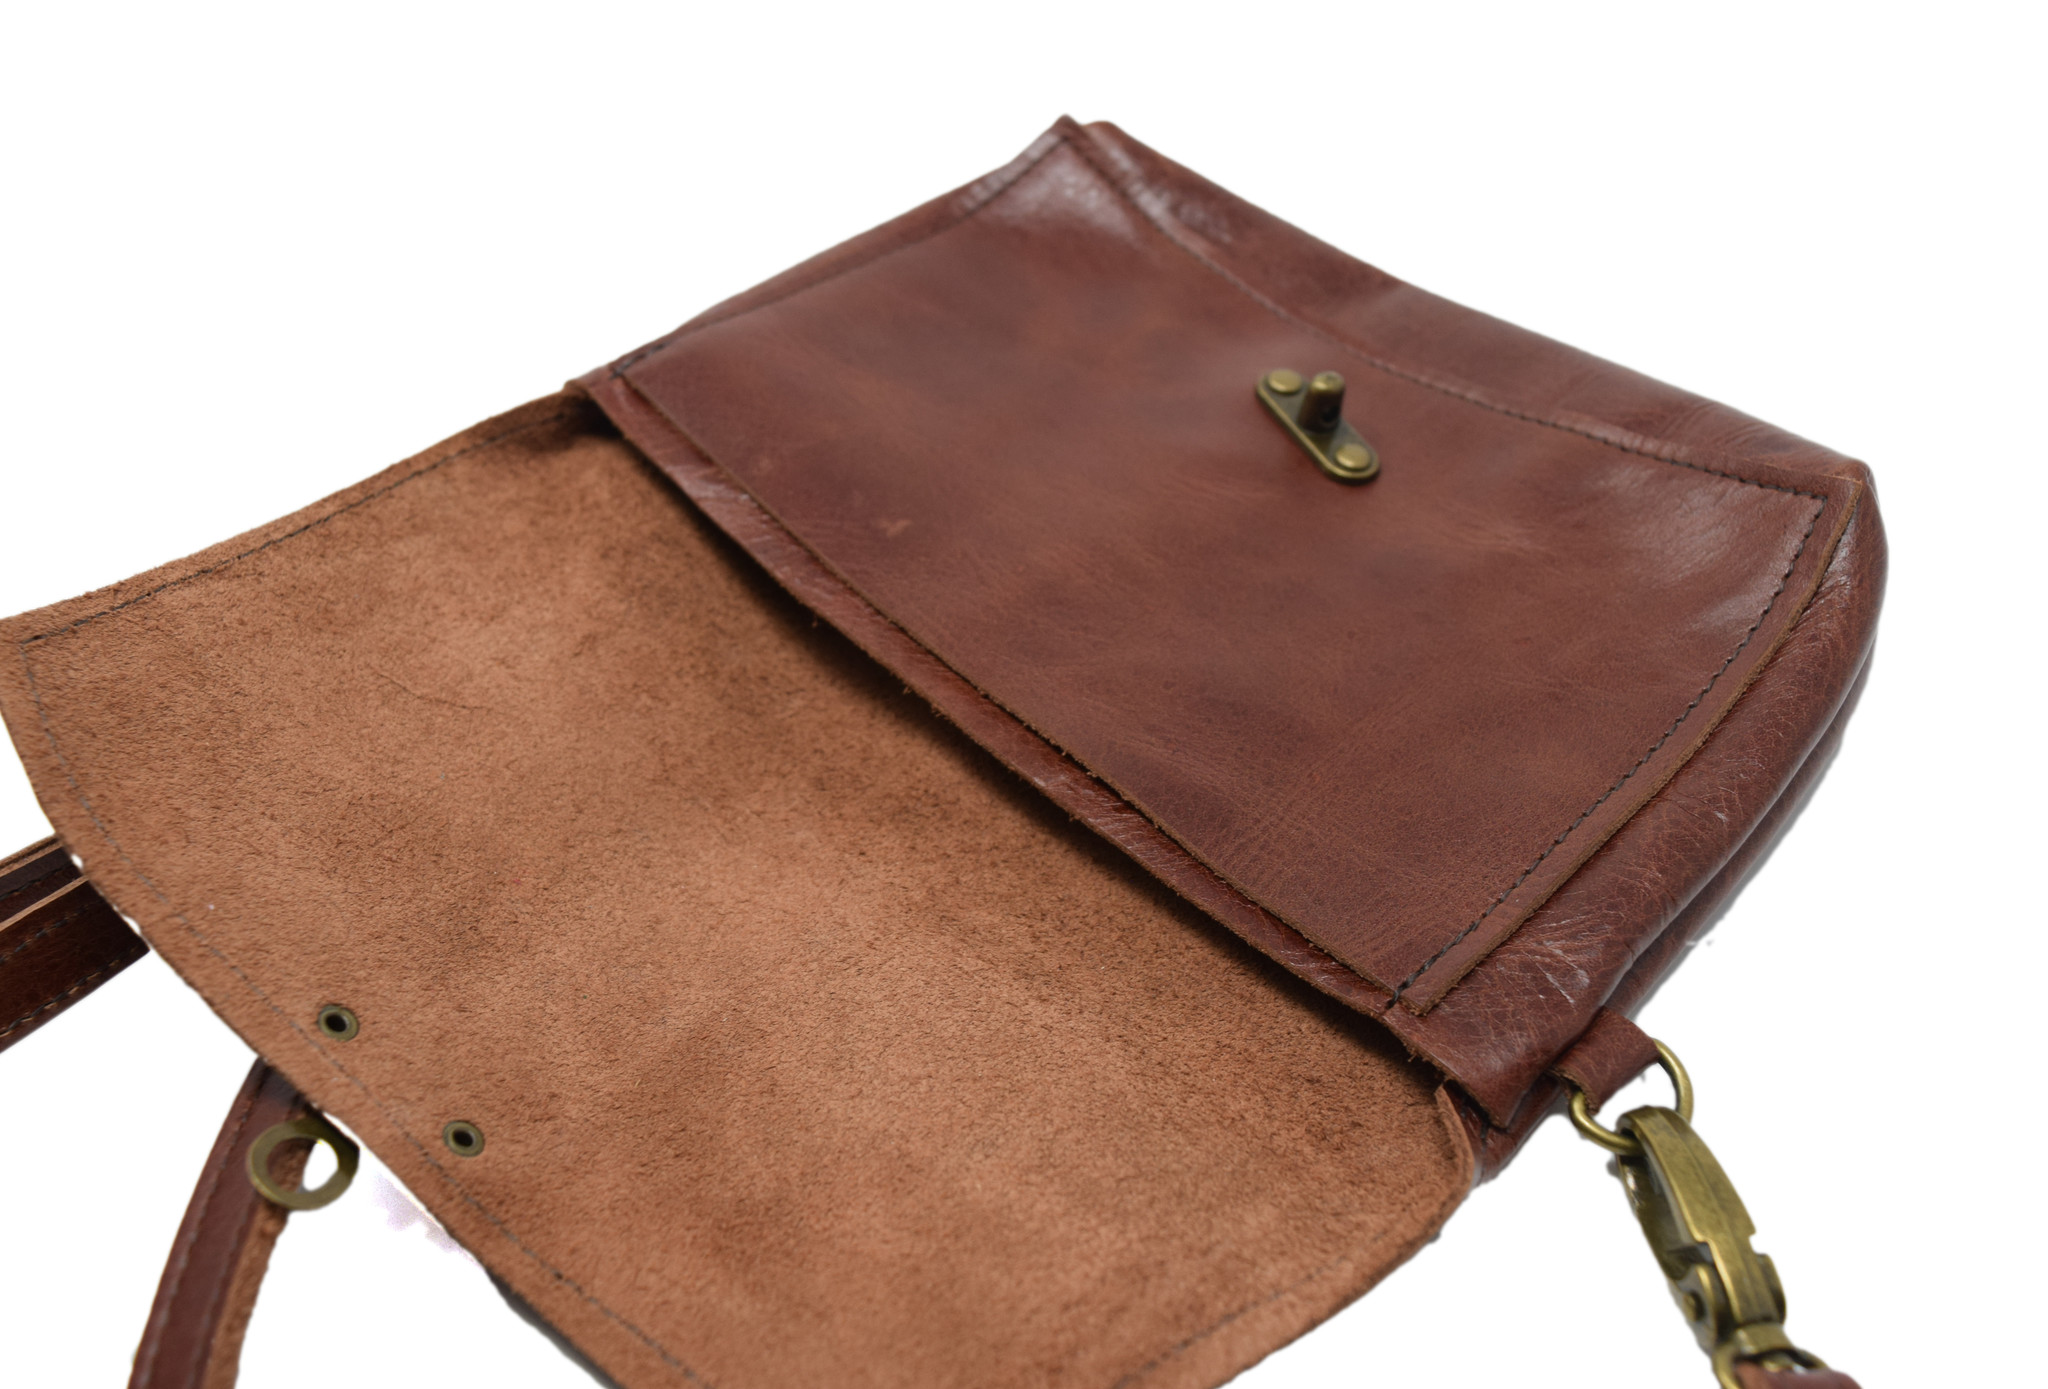 Minimalist Leather Purse Light Brown-3